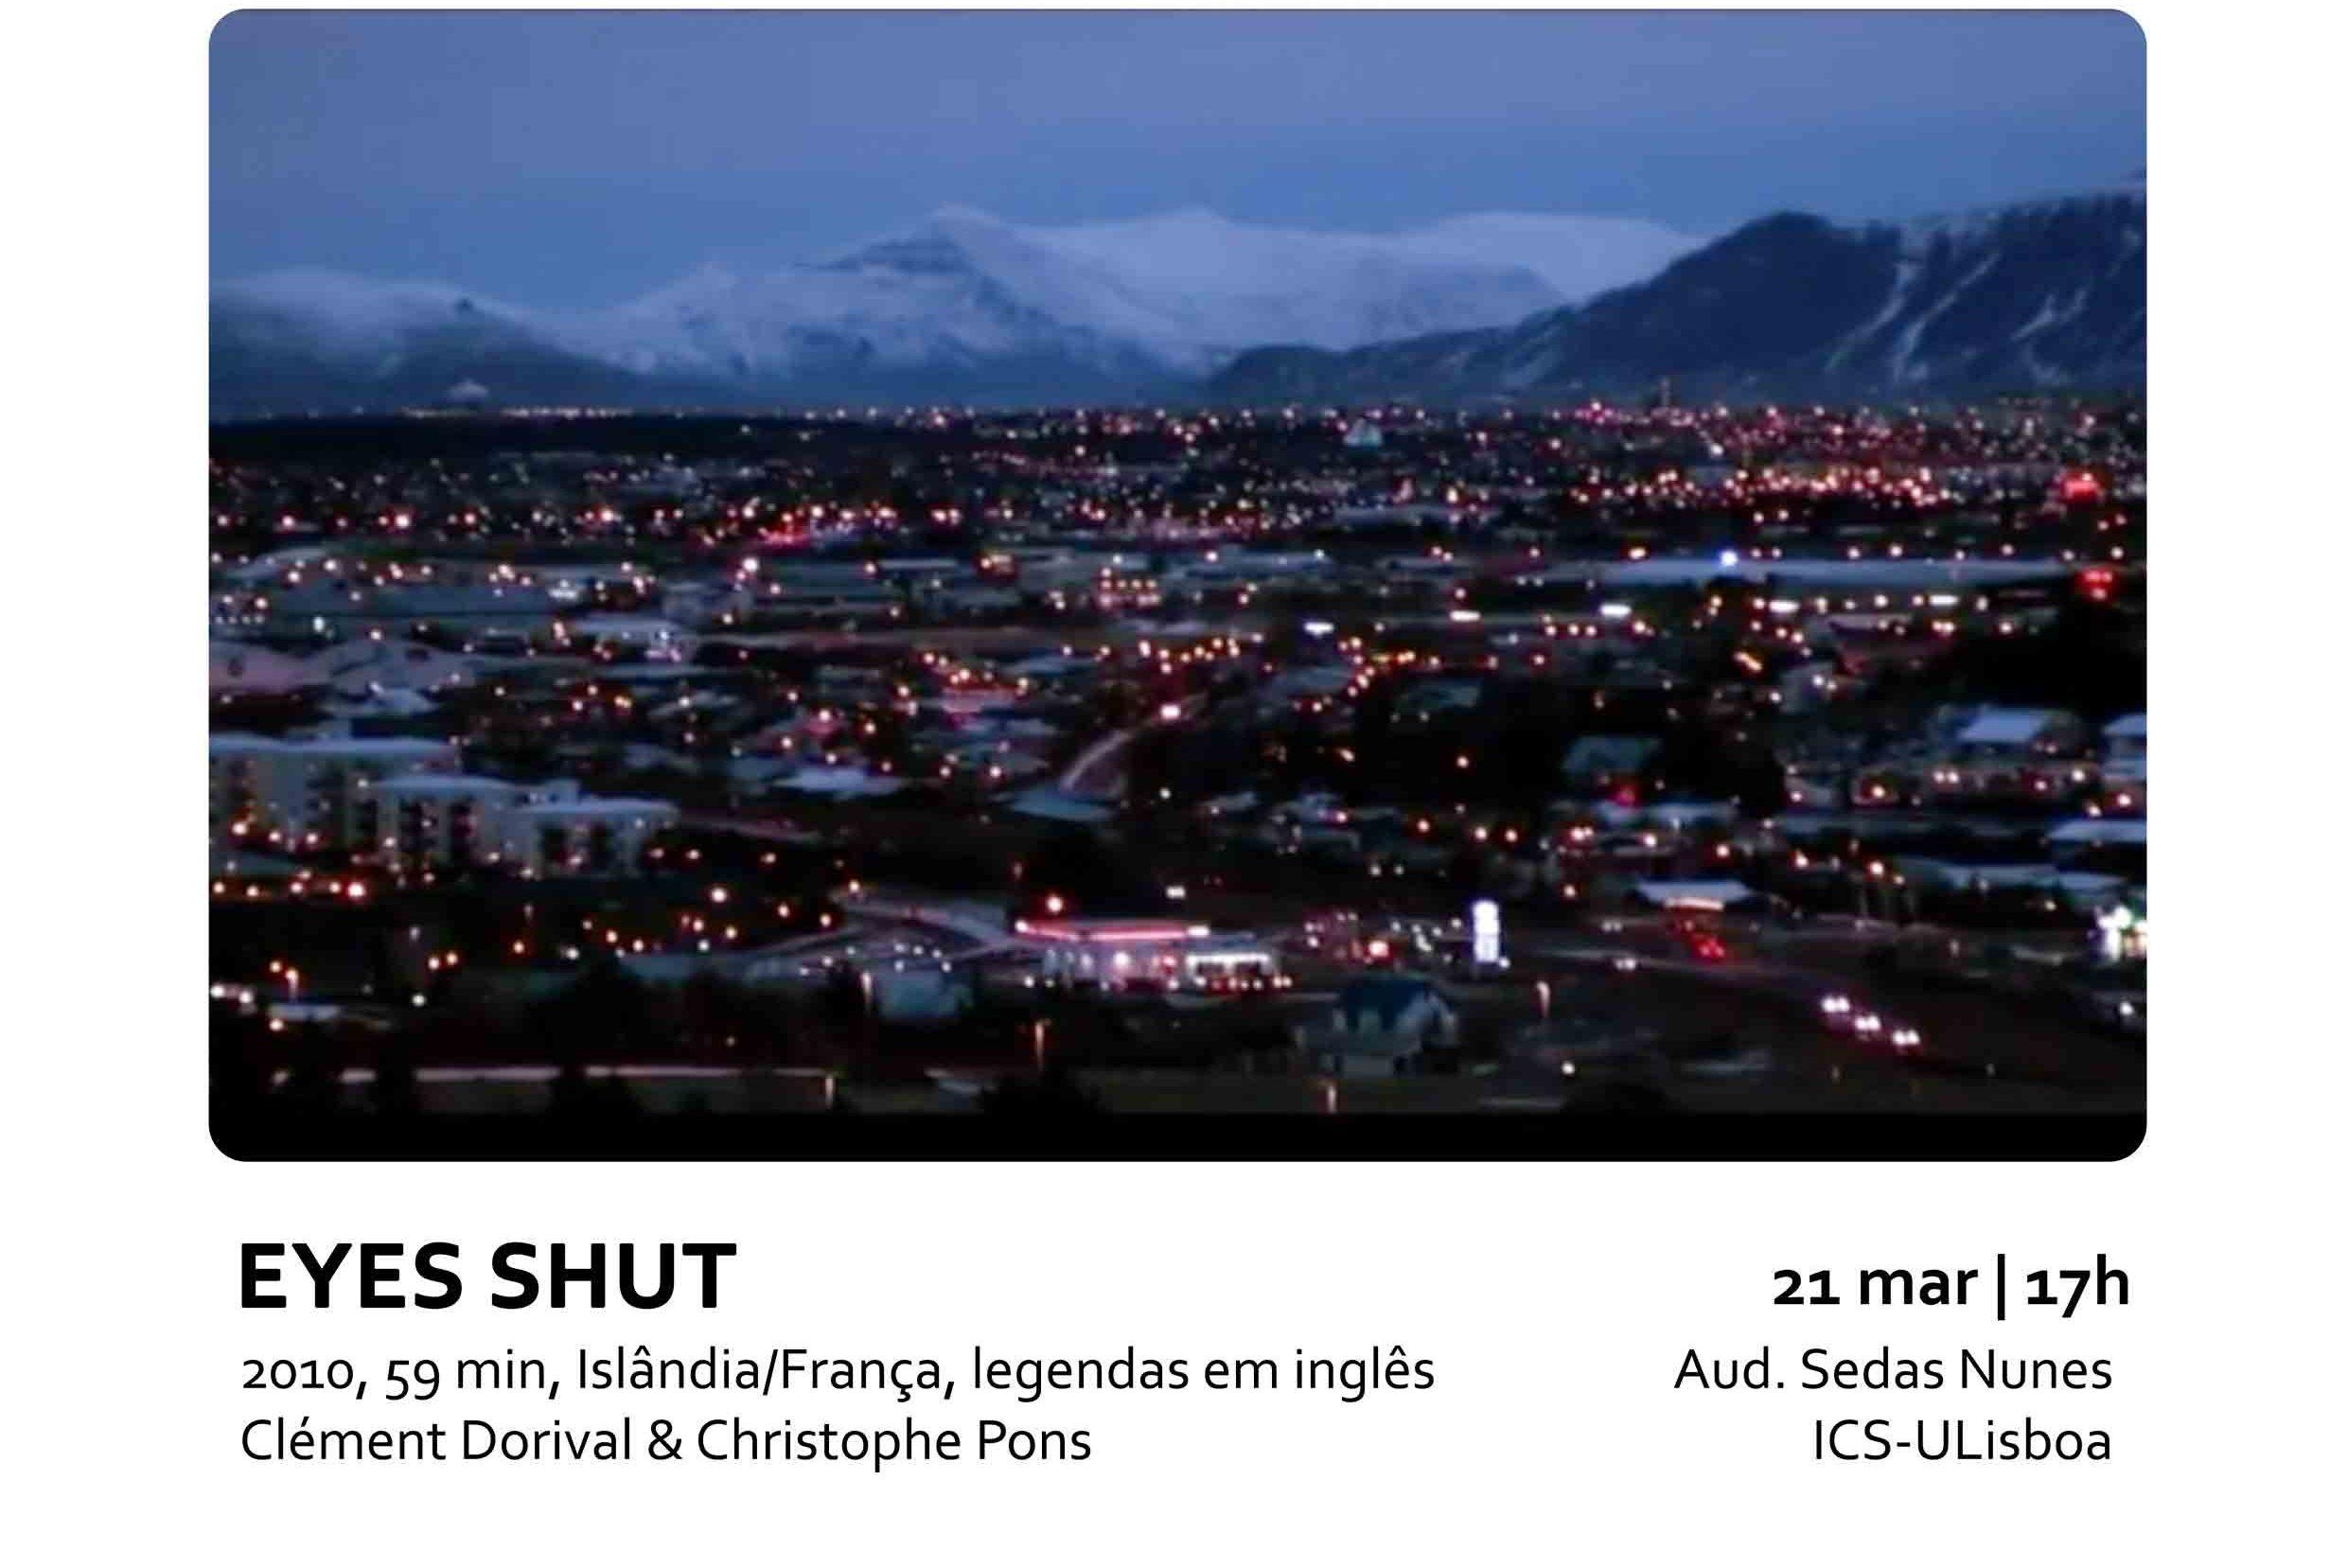 Eyes Shut: Ciências Sociais e Audiovisual